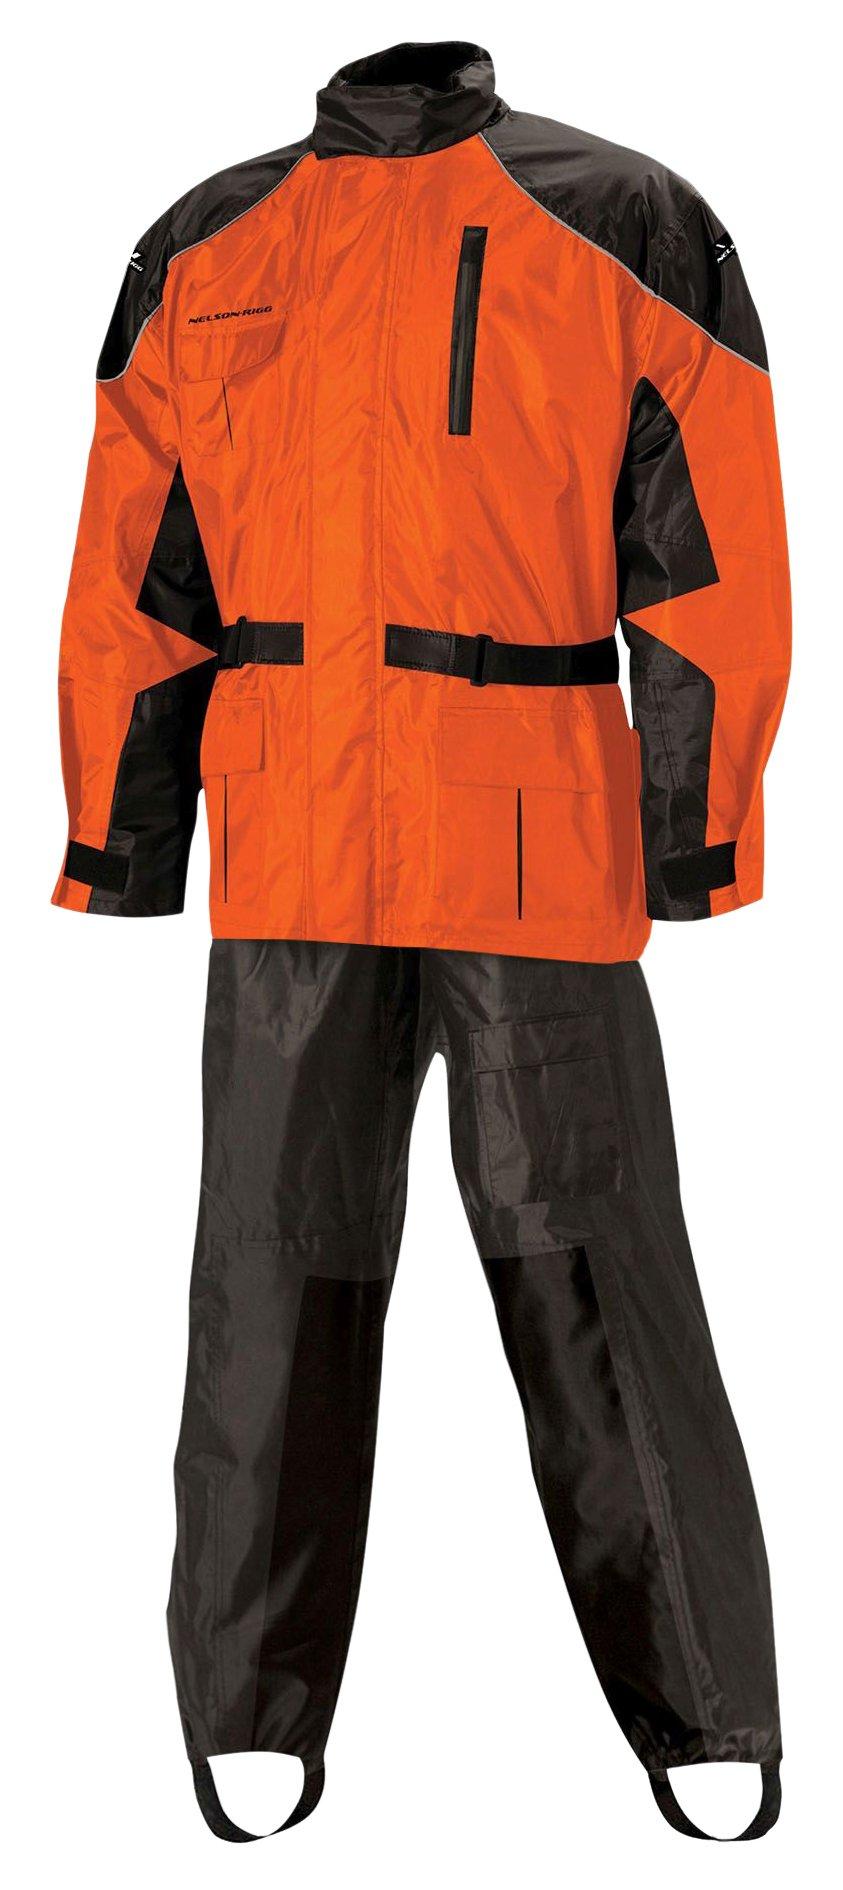 Nelson Rigg AS-3000 Unisex Adult AS-3000-ORG-05-XXL Aston Motorcycle Rain Suit 2-Piece, (Orange, XX-Large), X